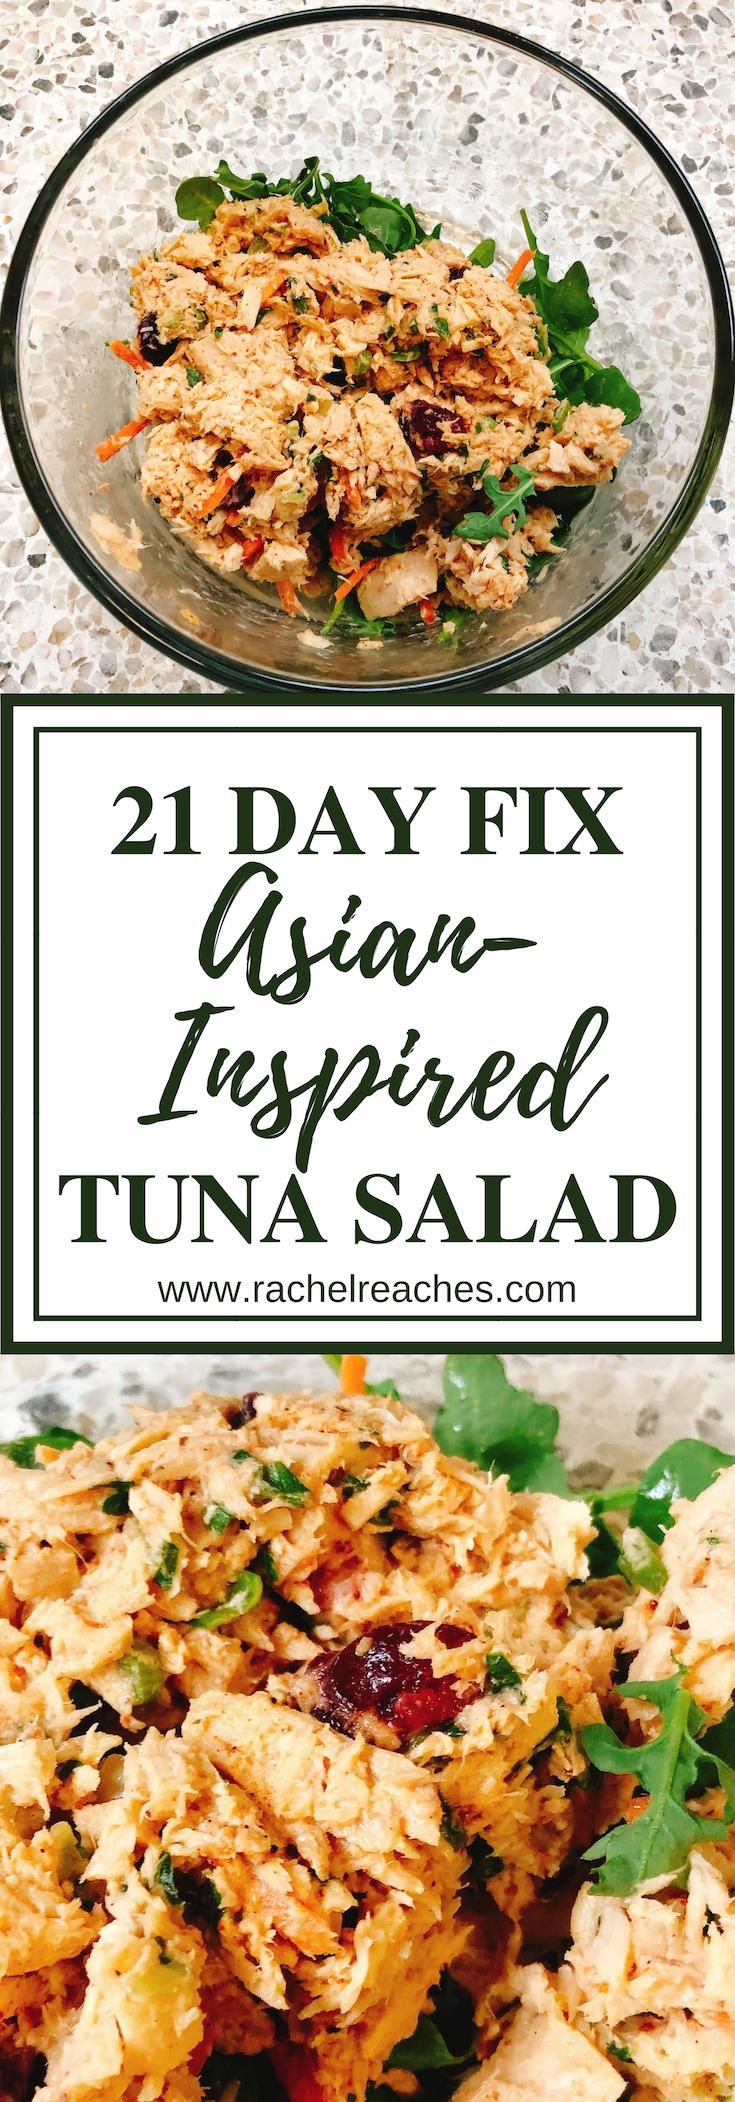 Asian-Inspired Tuna Salad Pin - 21 Day Fix.png